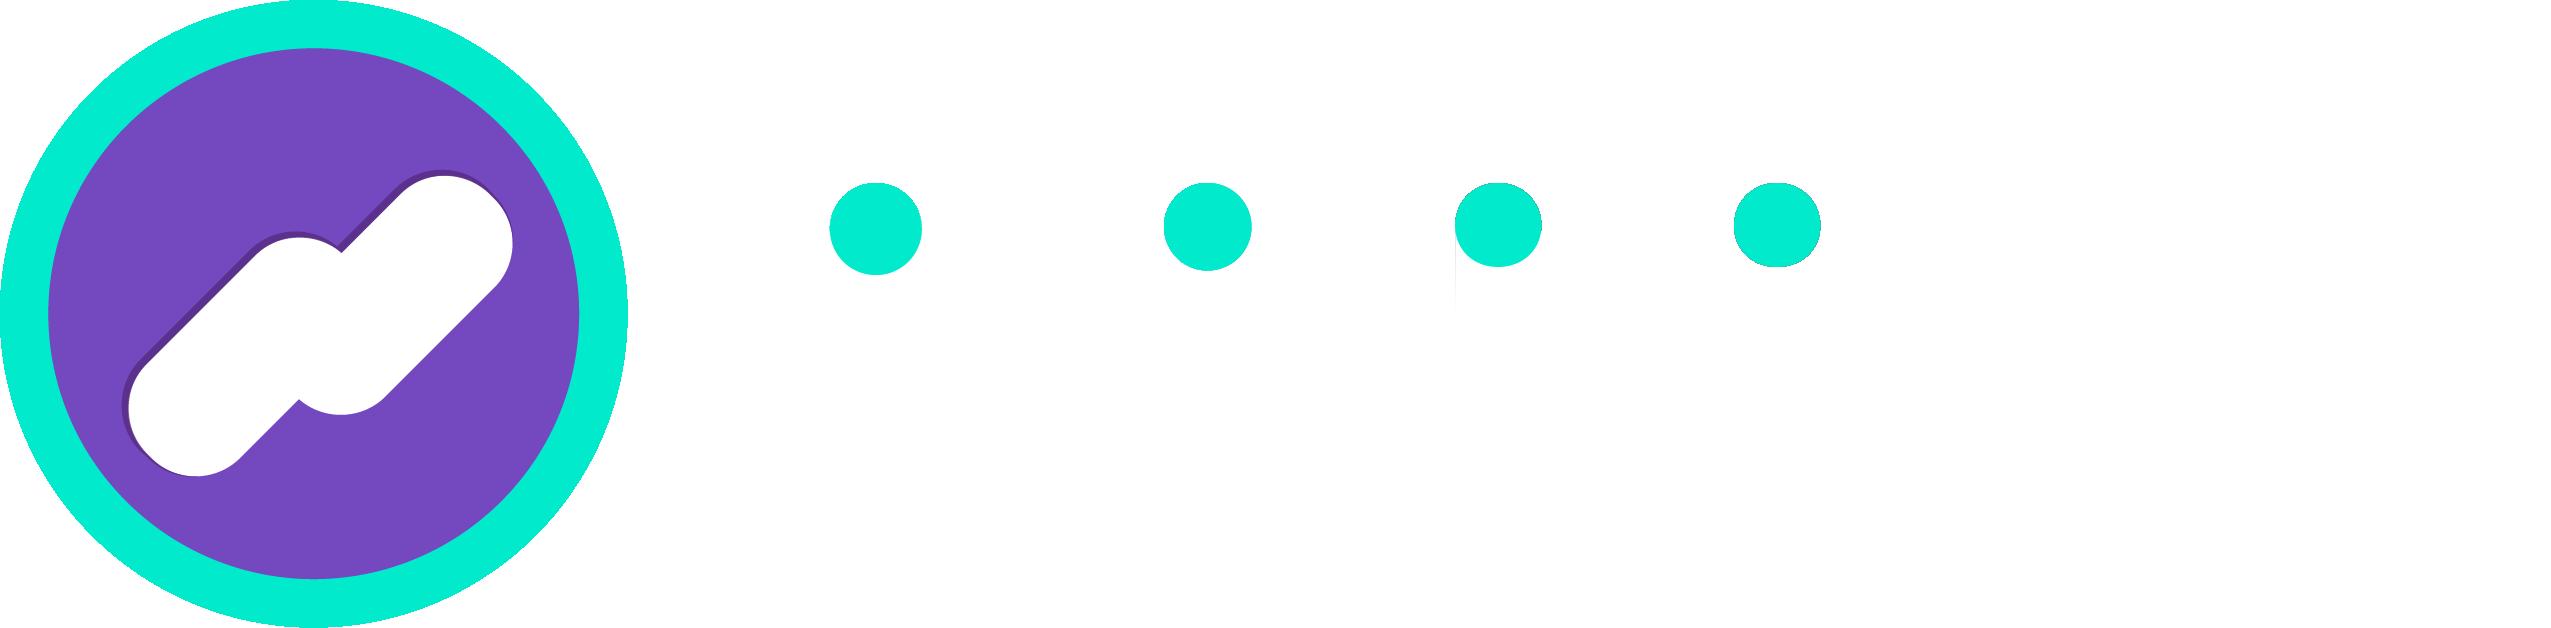 Urlinks